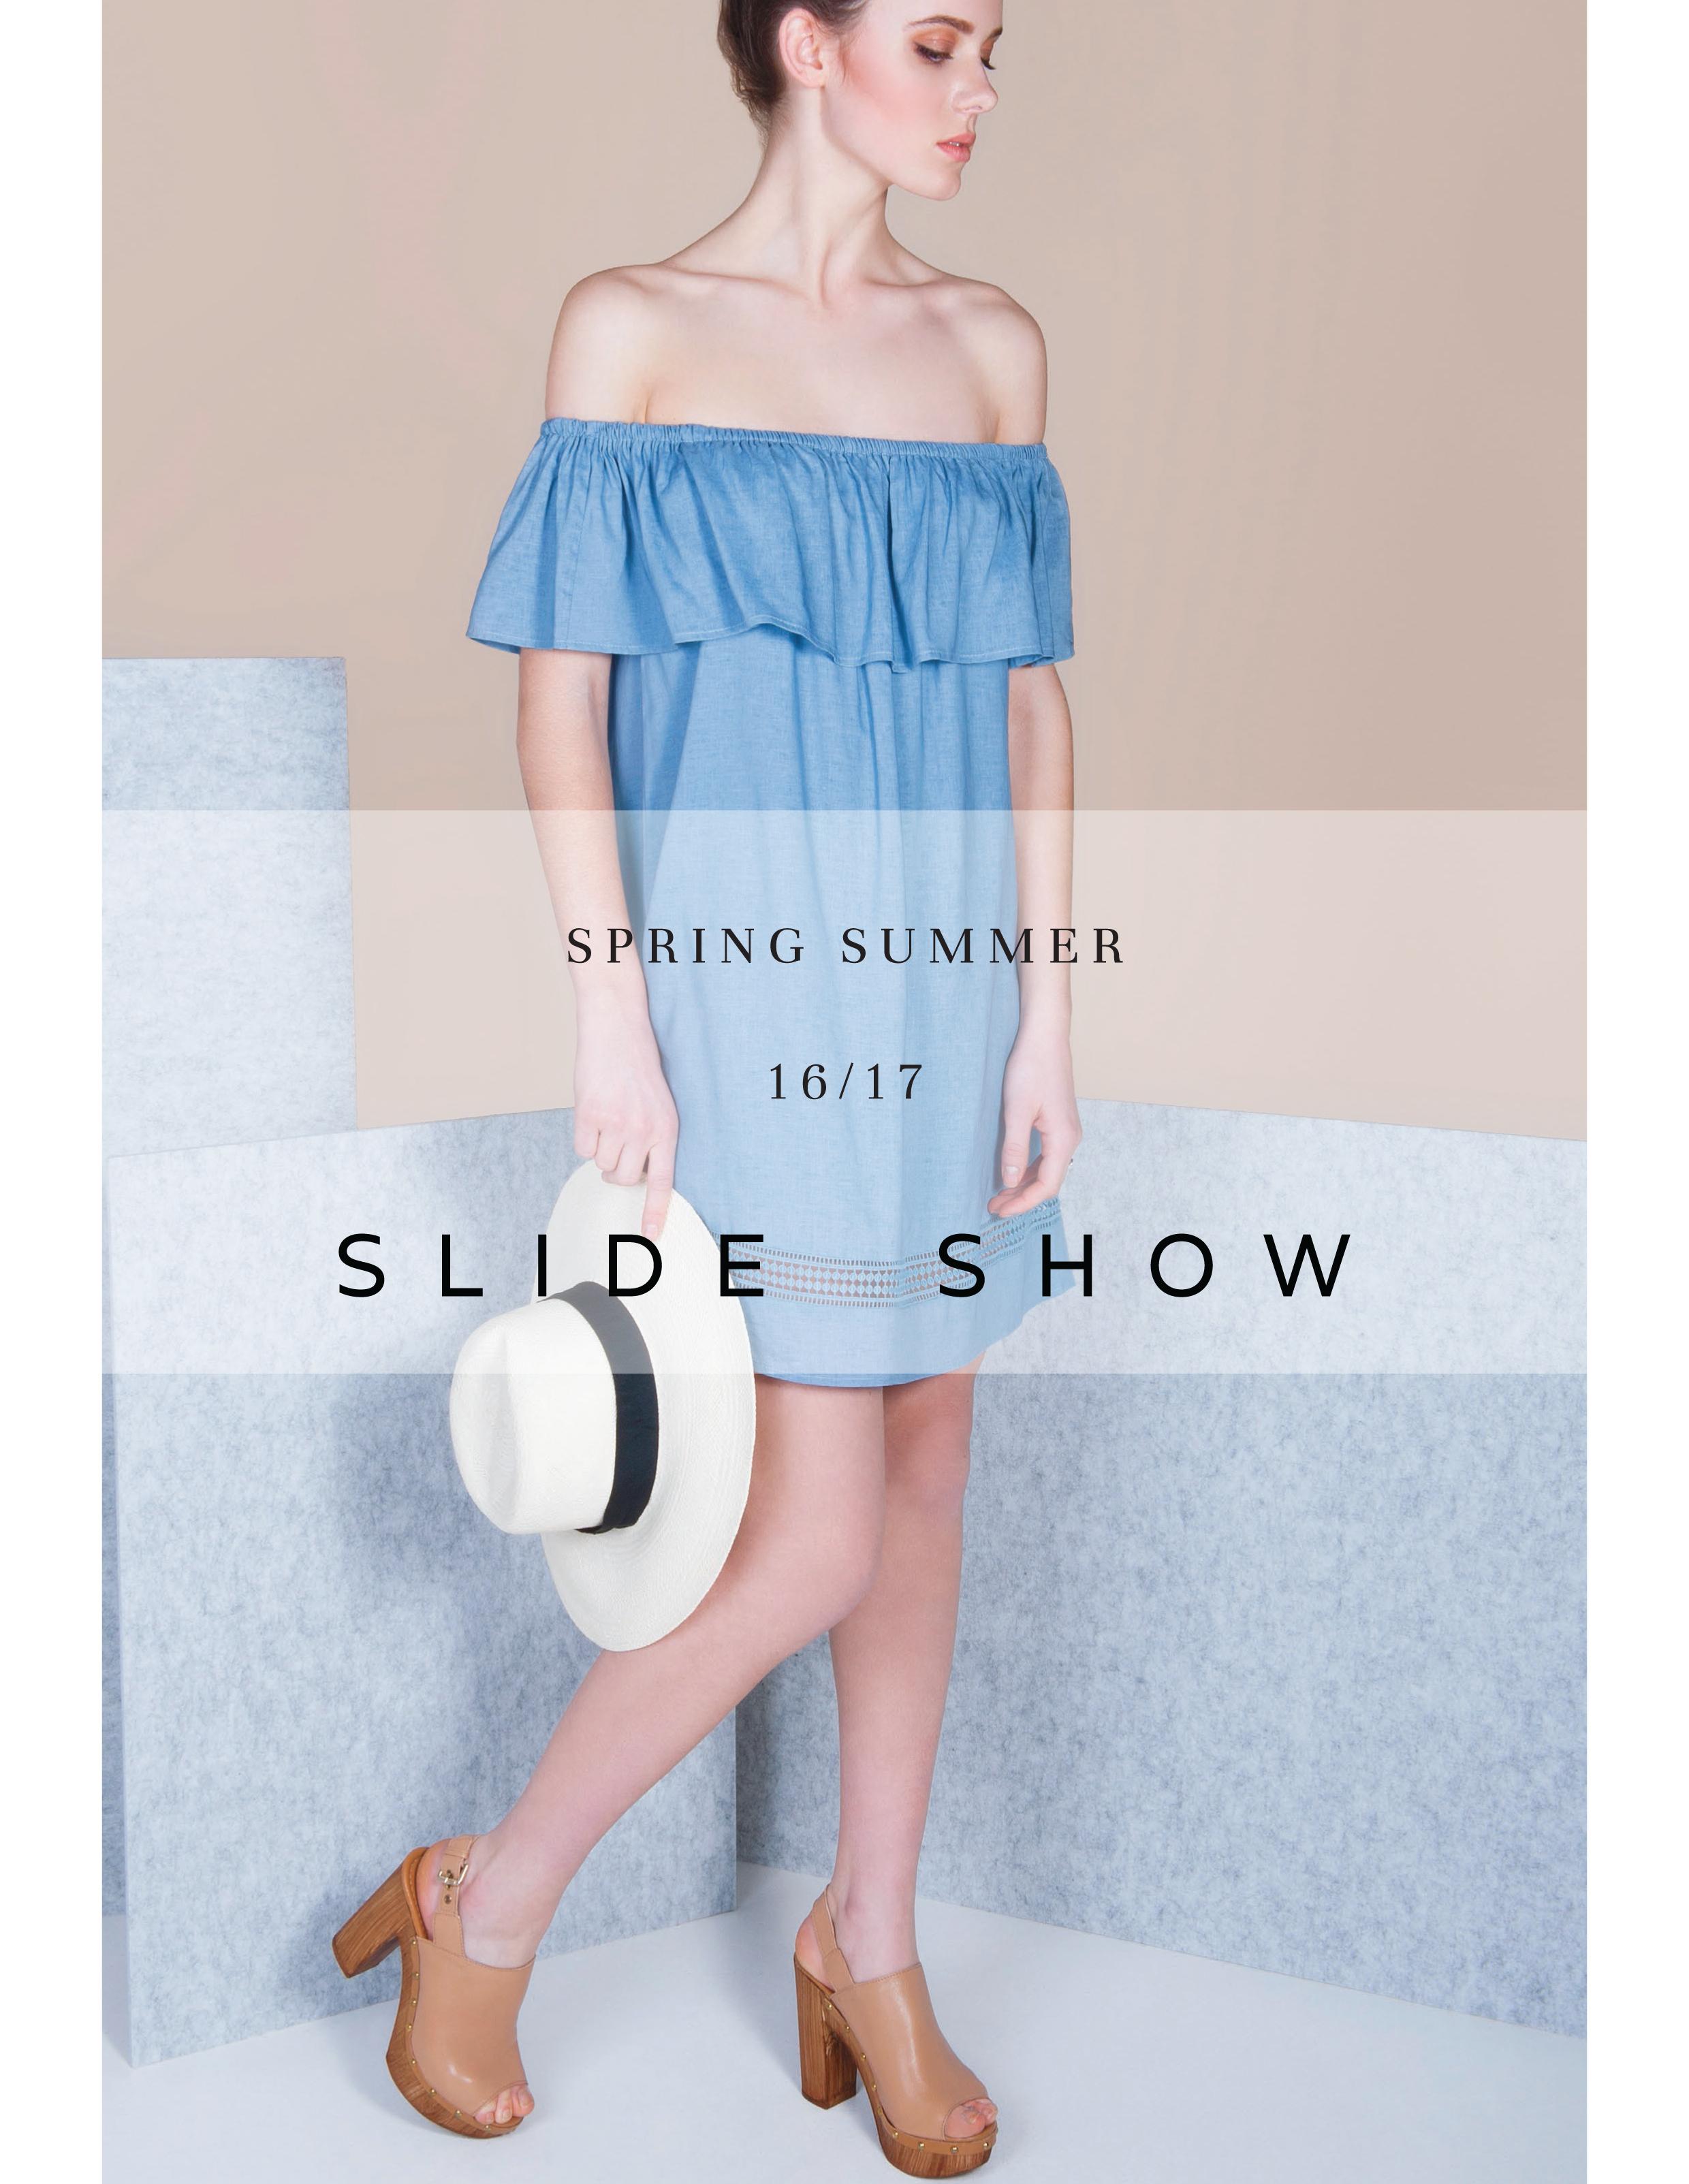 Slide Show Lookbook SS16/17